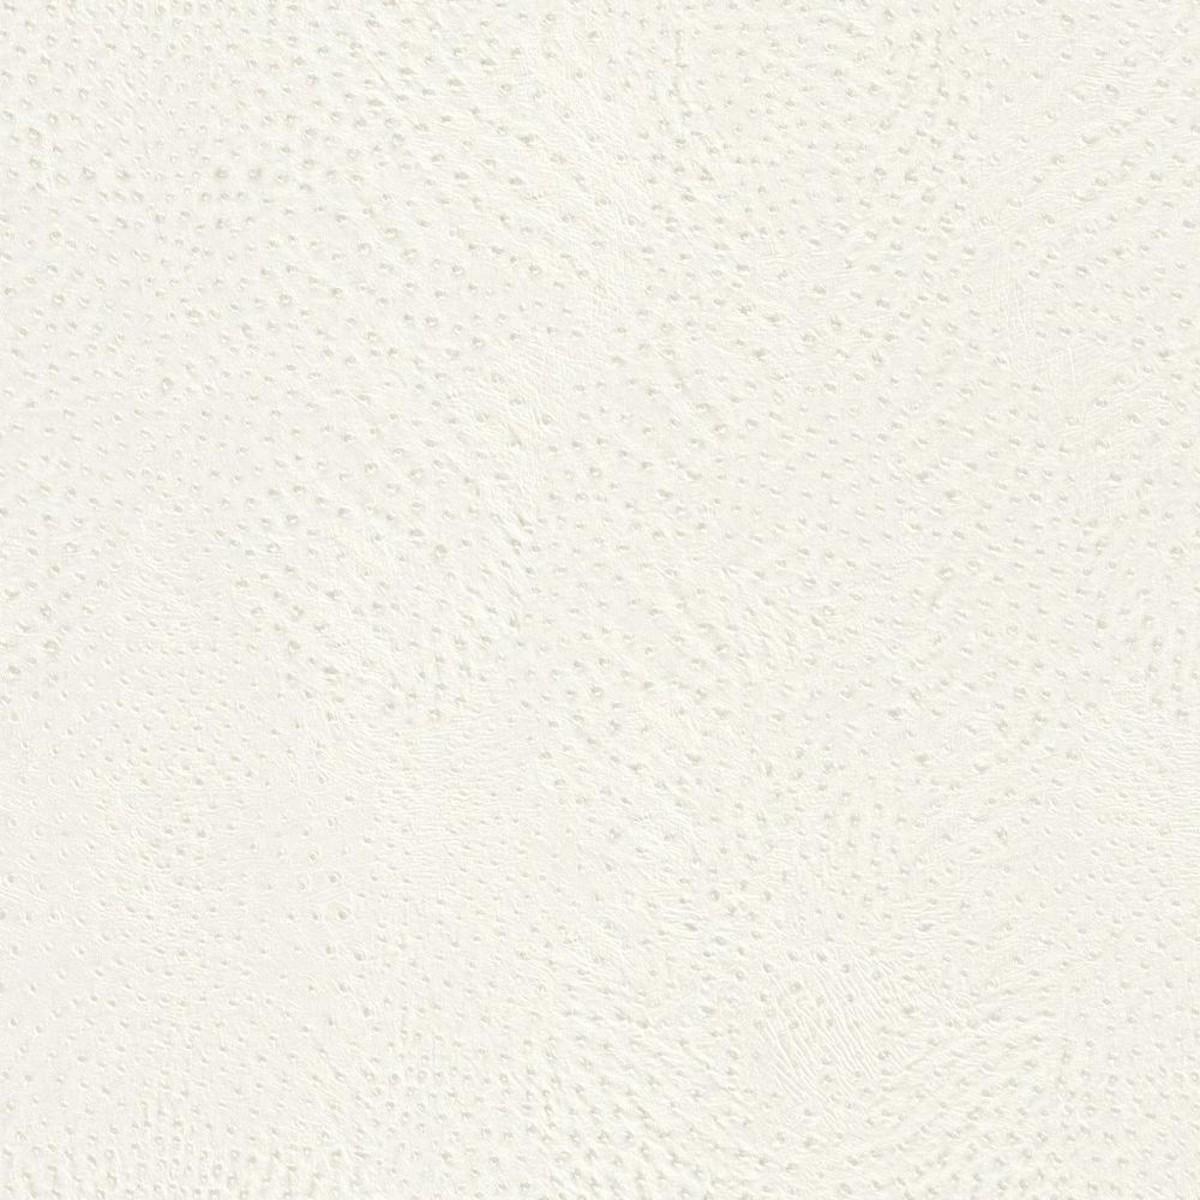 Обои флизелиновые Rasch African Queen белые 0.53 м 423655